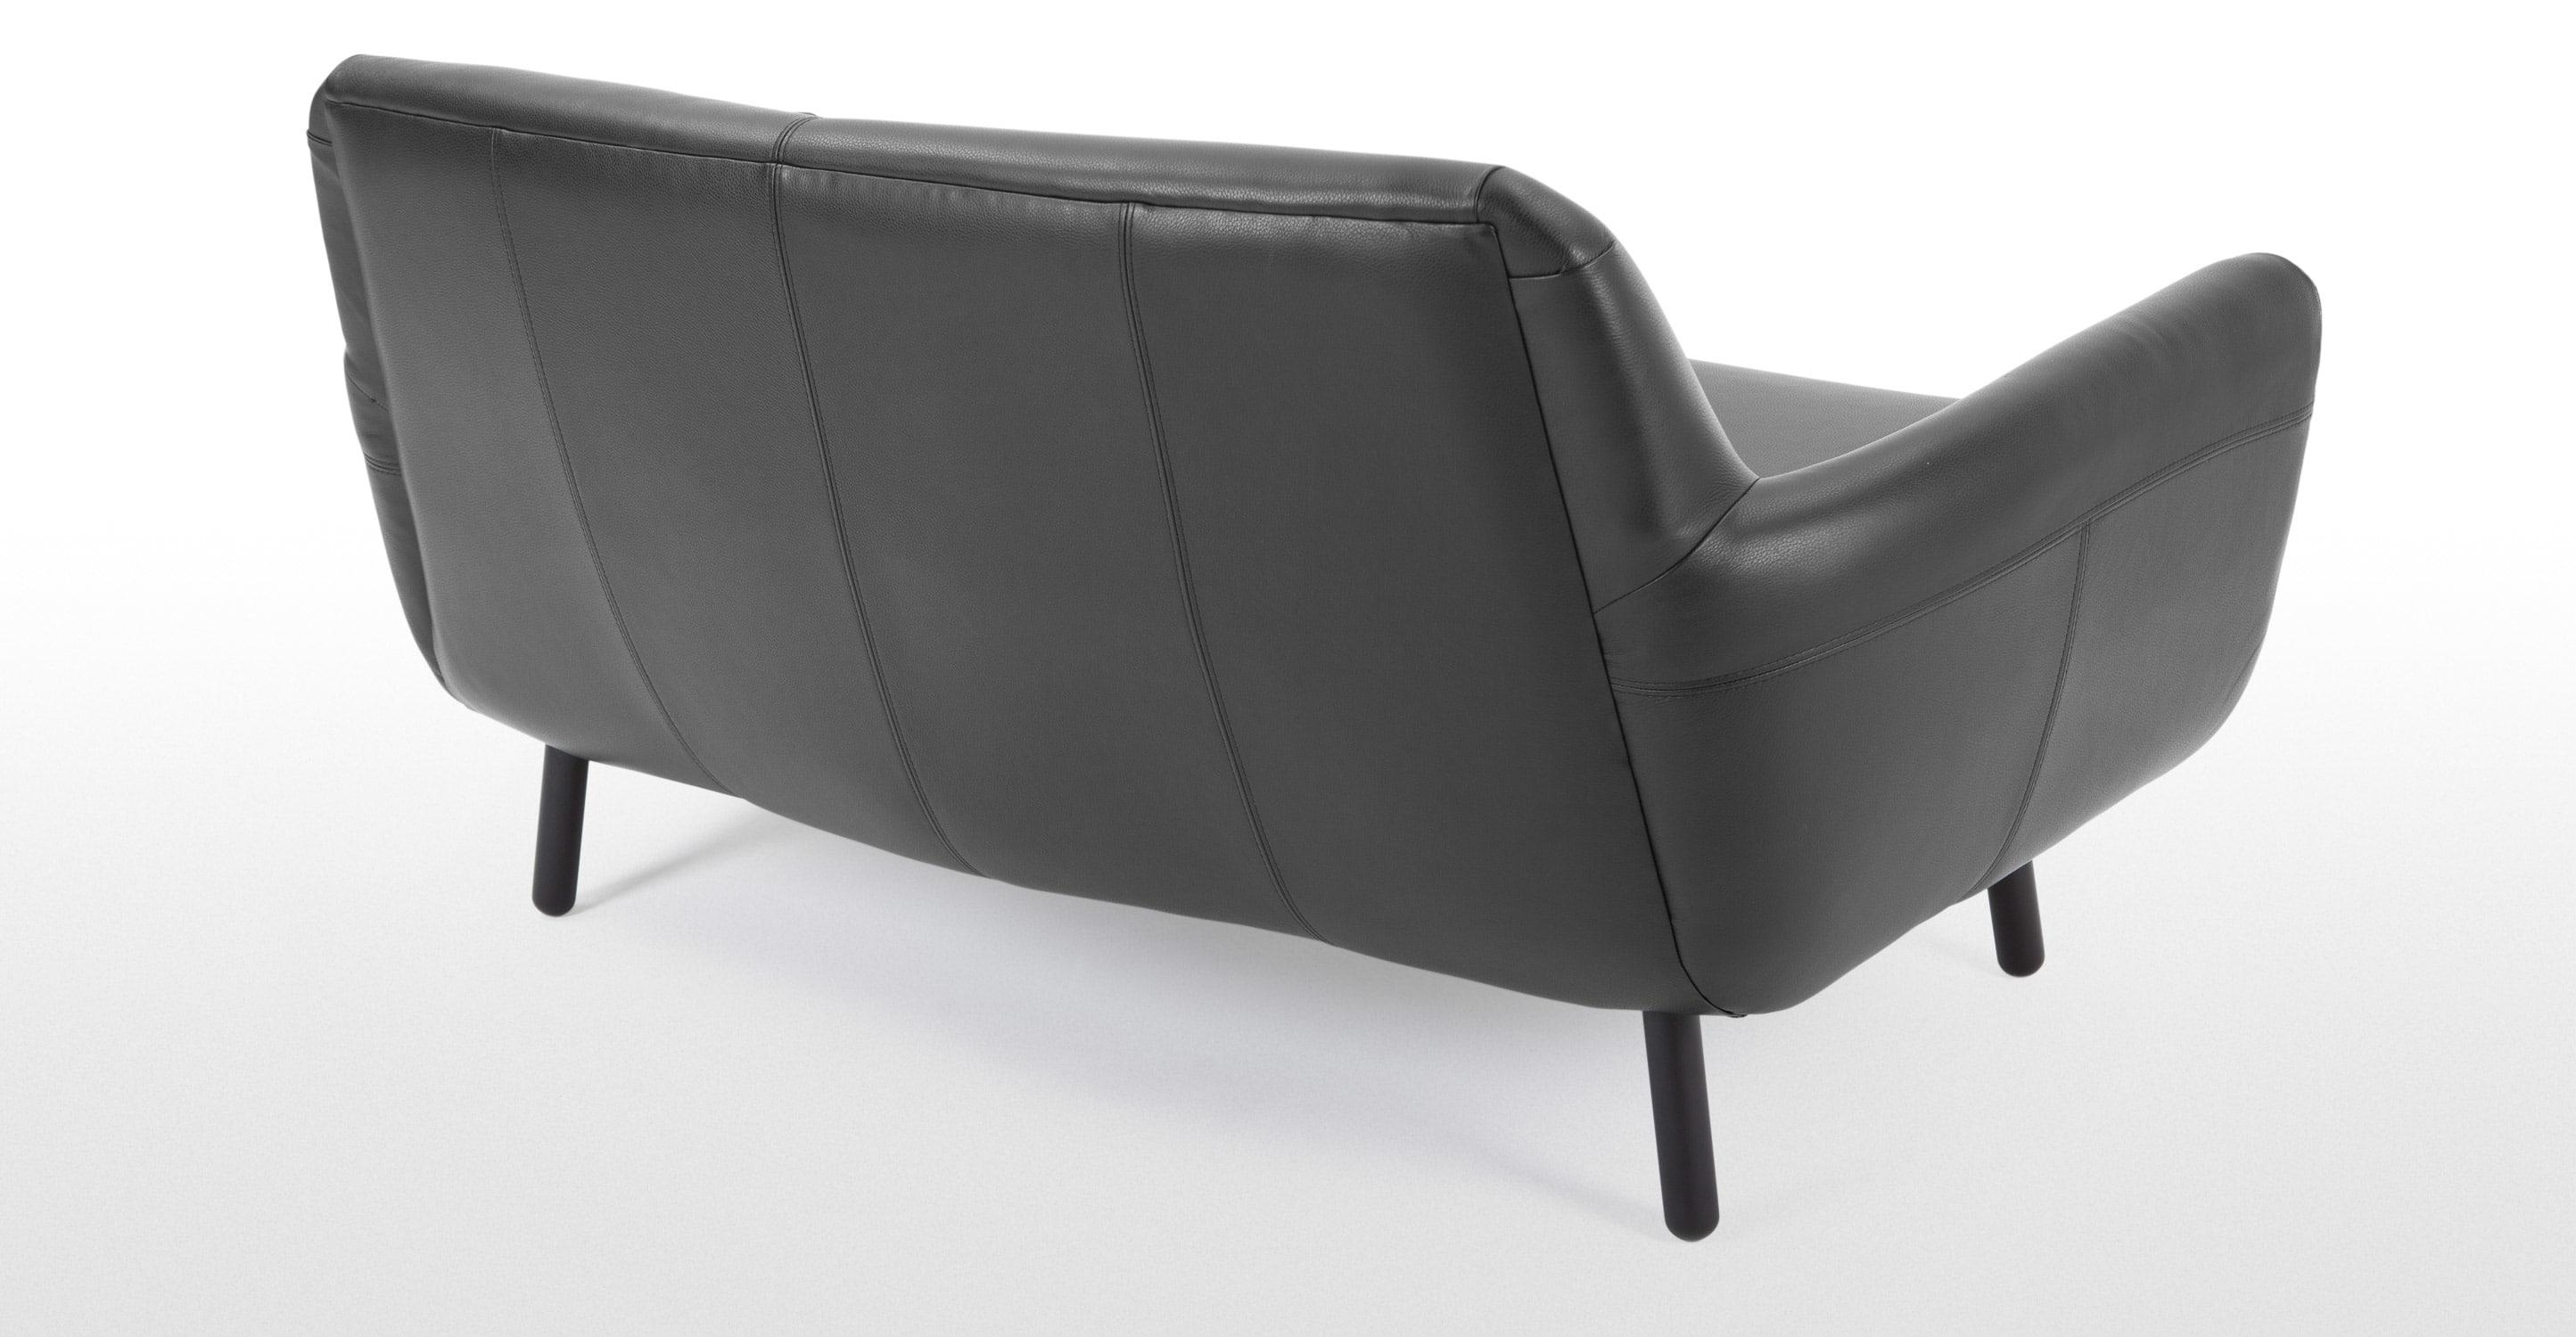 Jonah 2 Seater Sofa In Liquorice Black Premium Leather | Made in Black 2 Seater Sofas